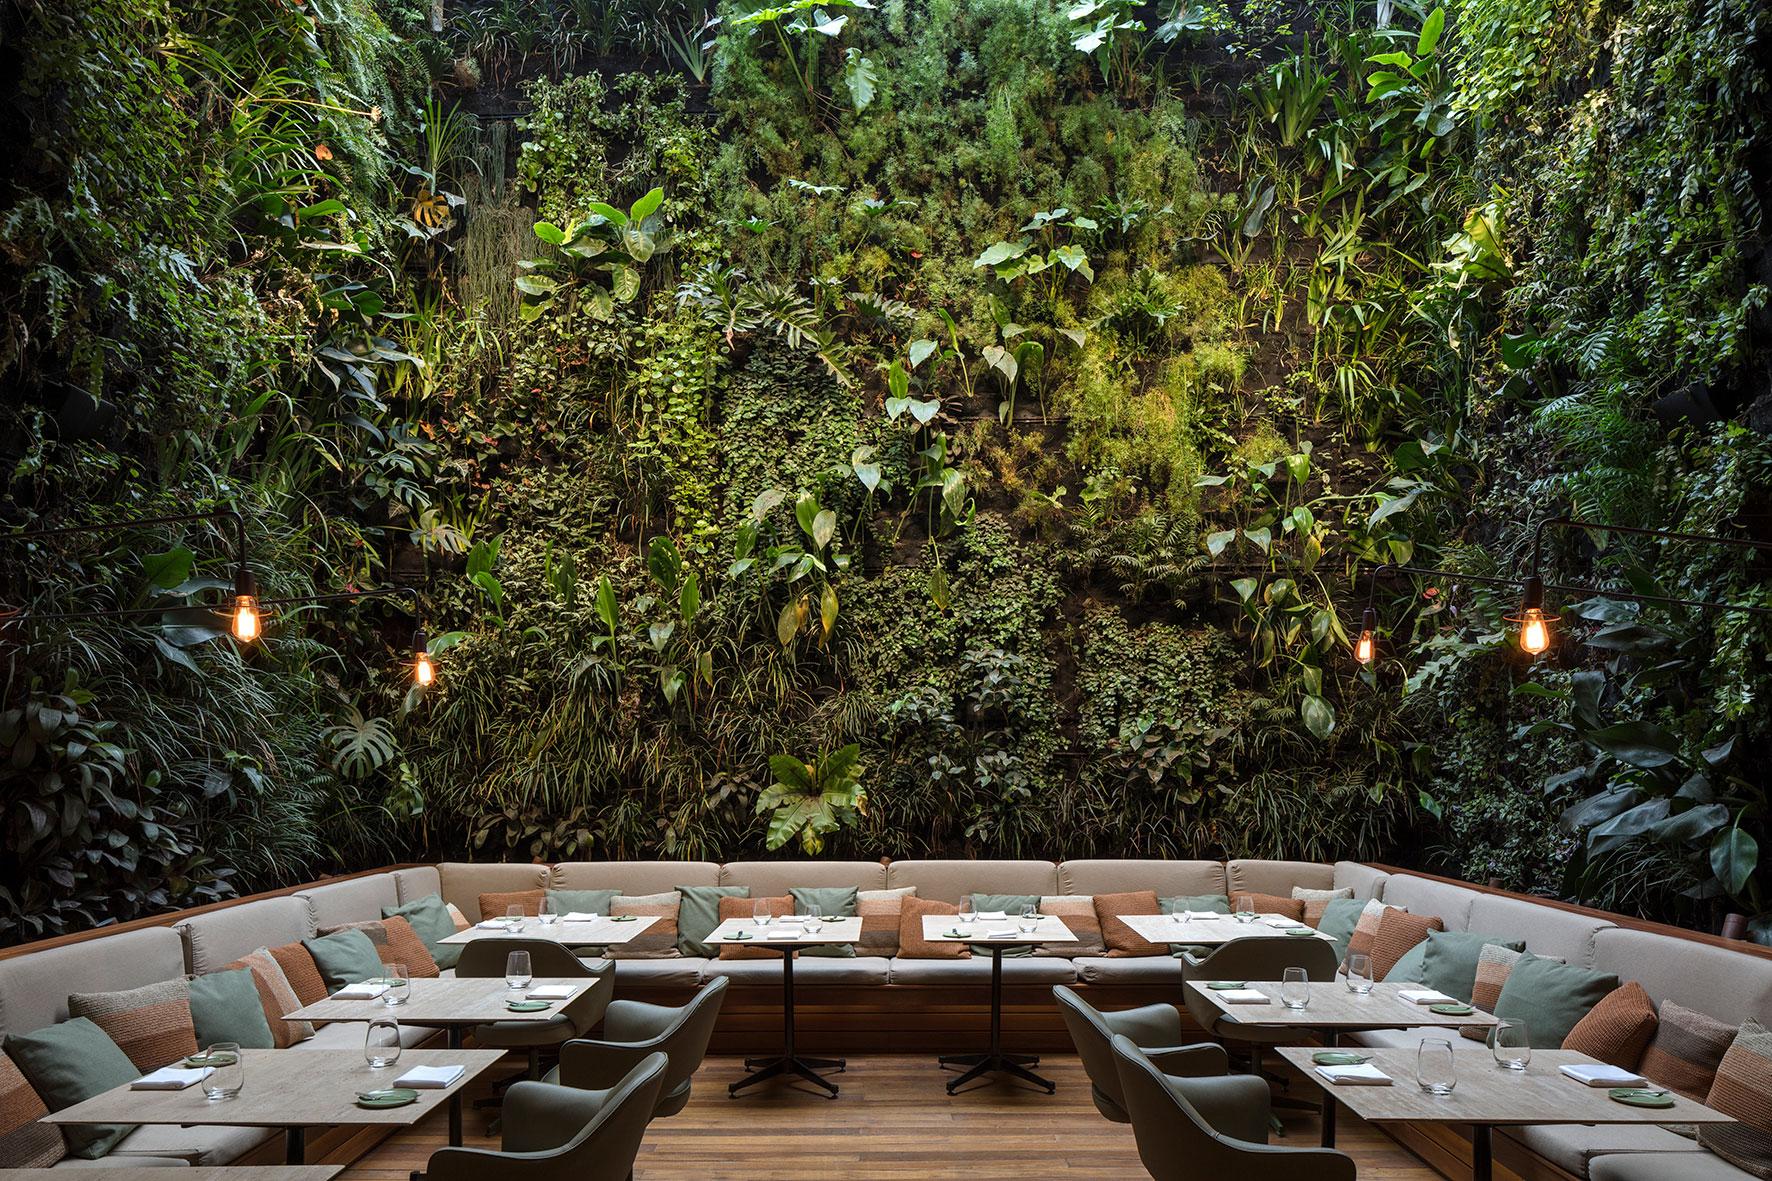 Hotel Emiliano Restaurant